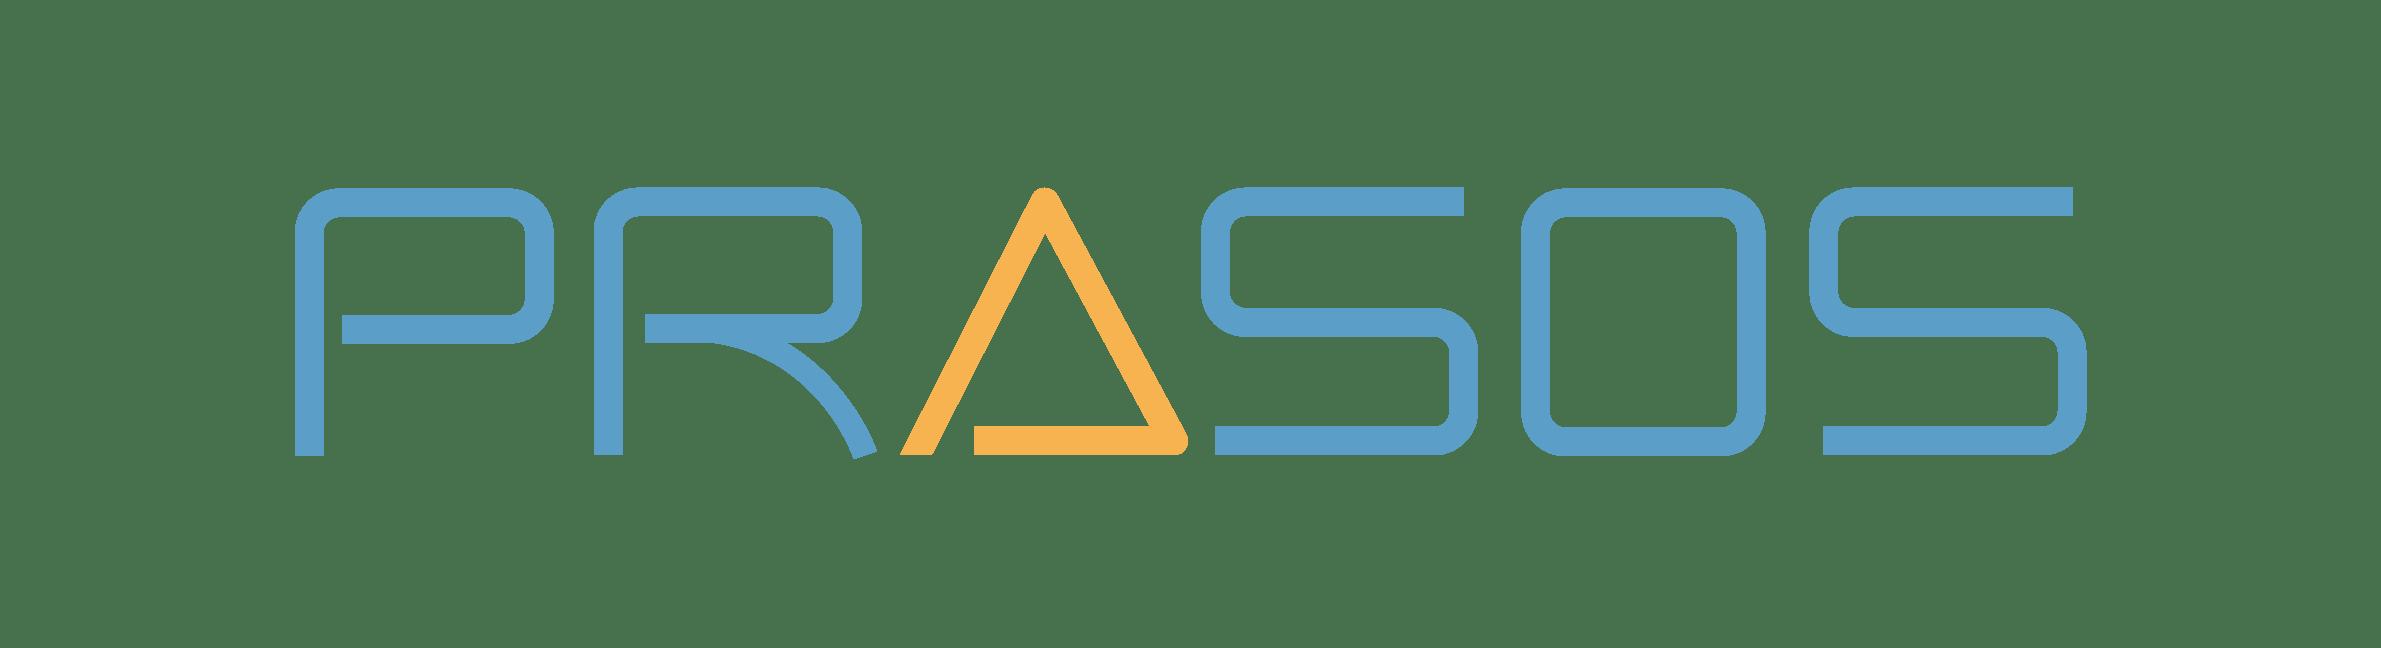 Prasos company logo